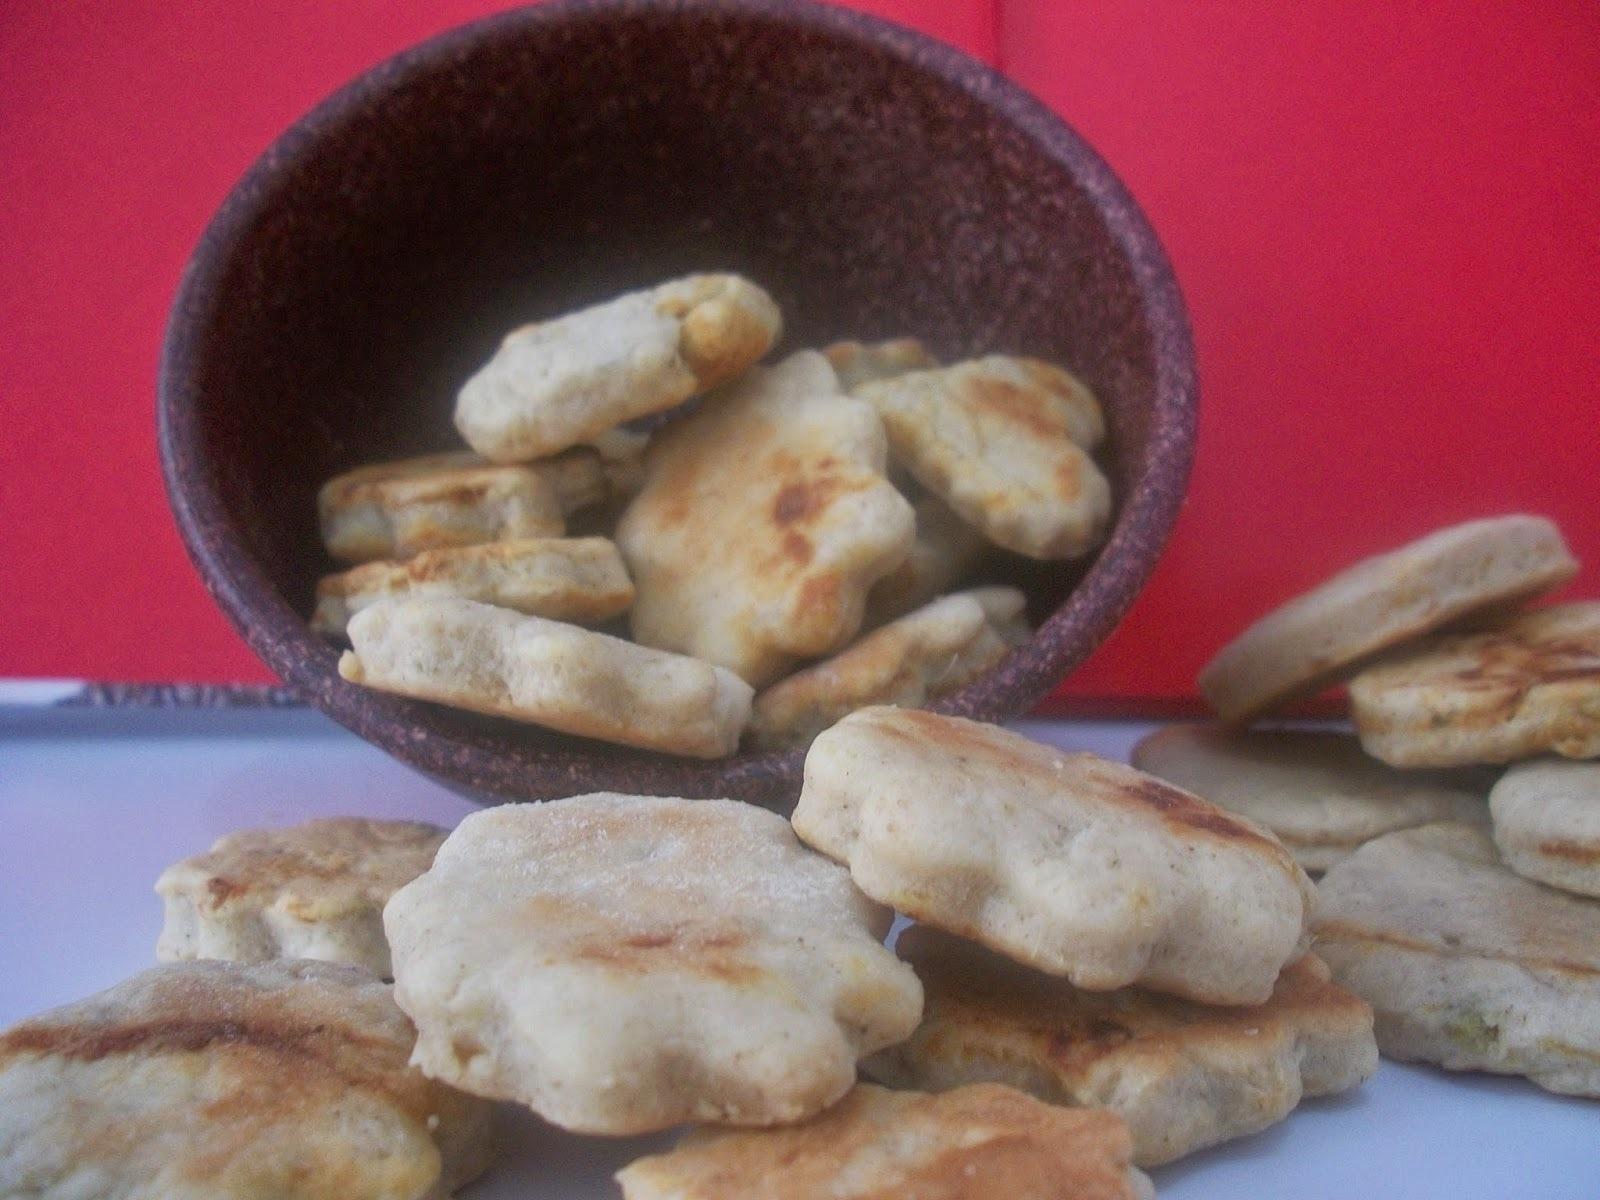 Biscoitos de batata doce - Sweet potato biscuits